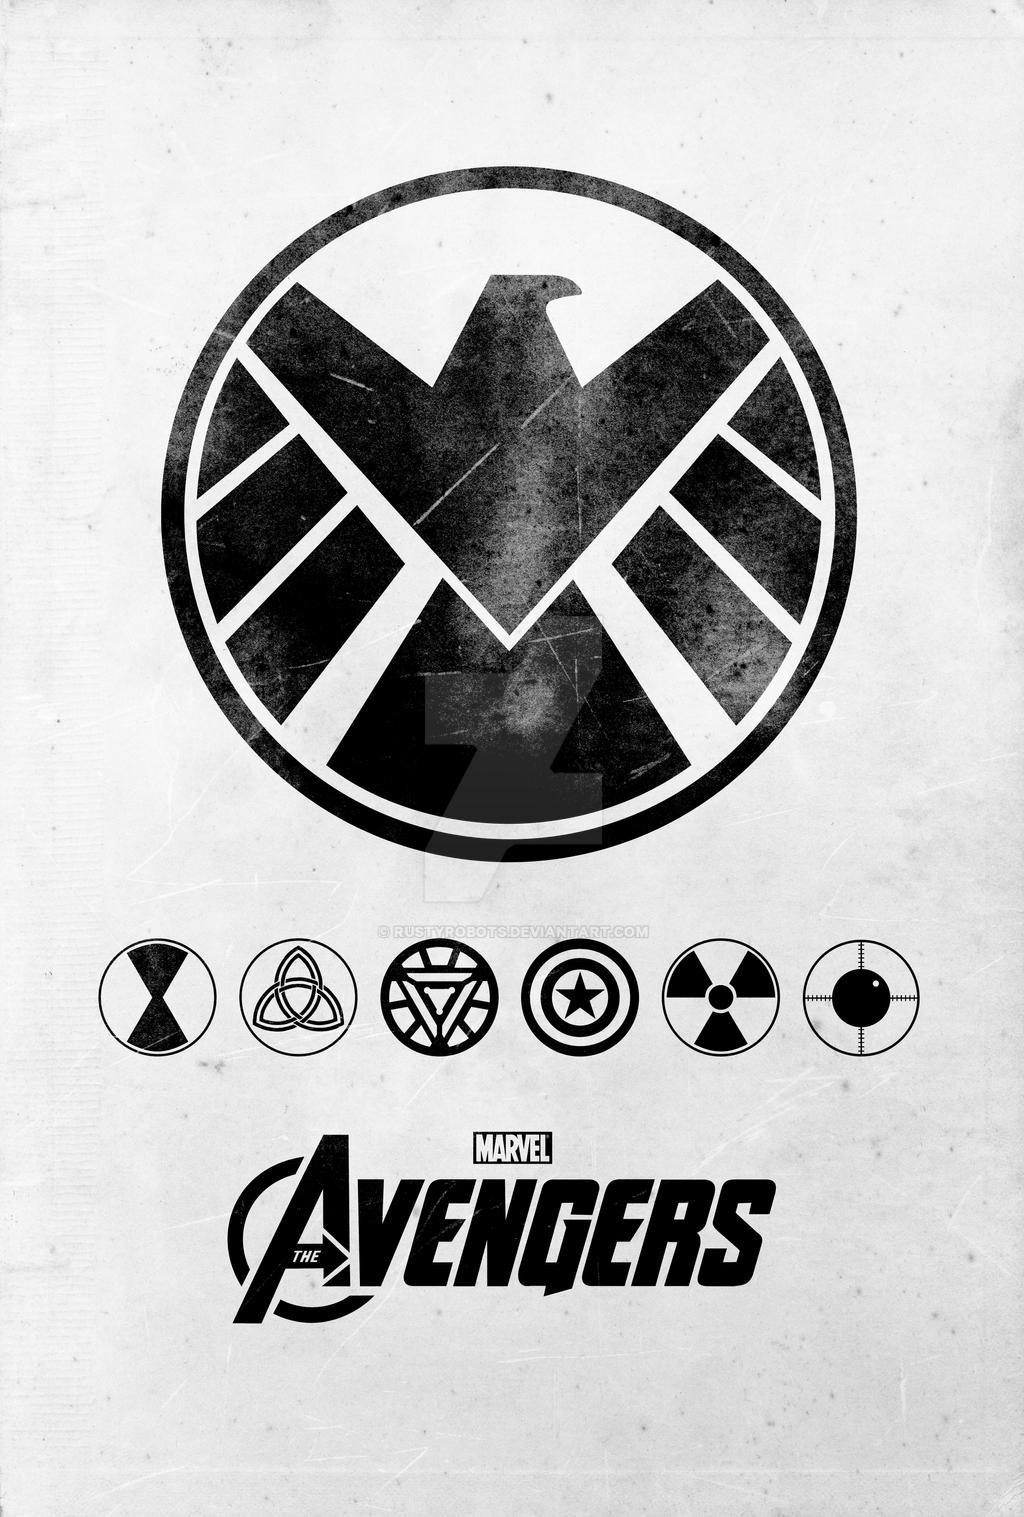 avengers poster by rustyrobots avengers poster by rustyrobots - Avengers Logo Coloring Pages